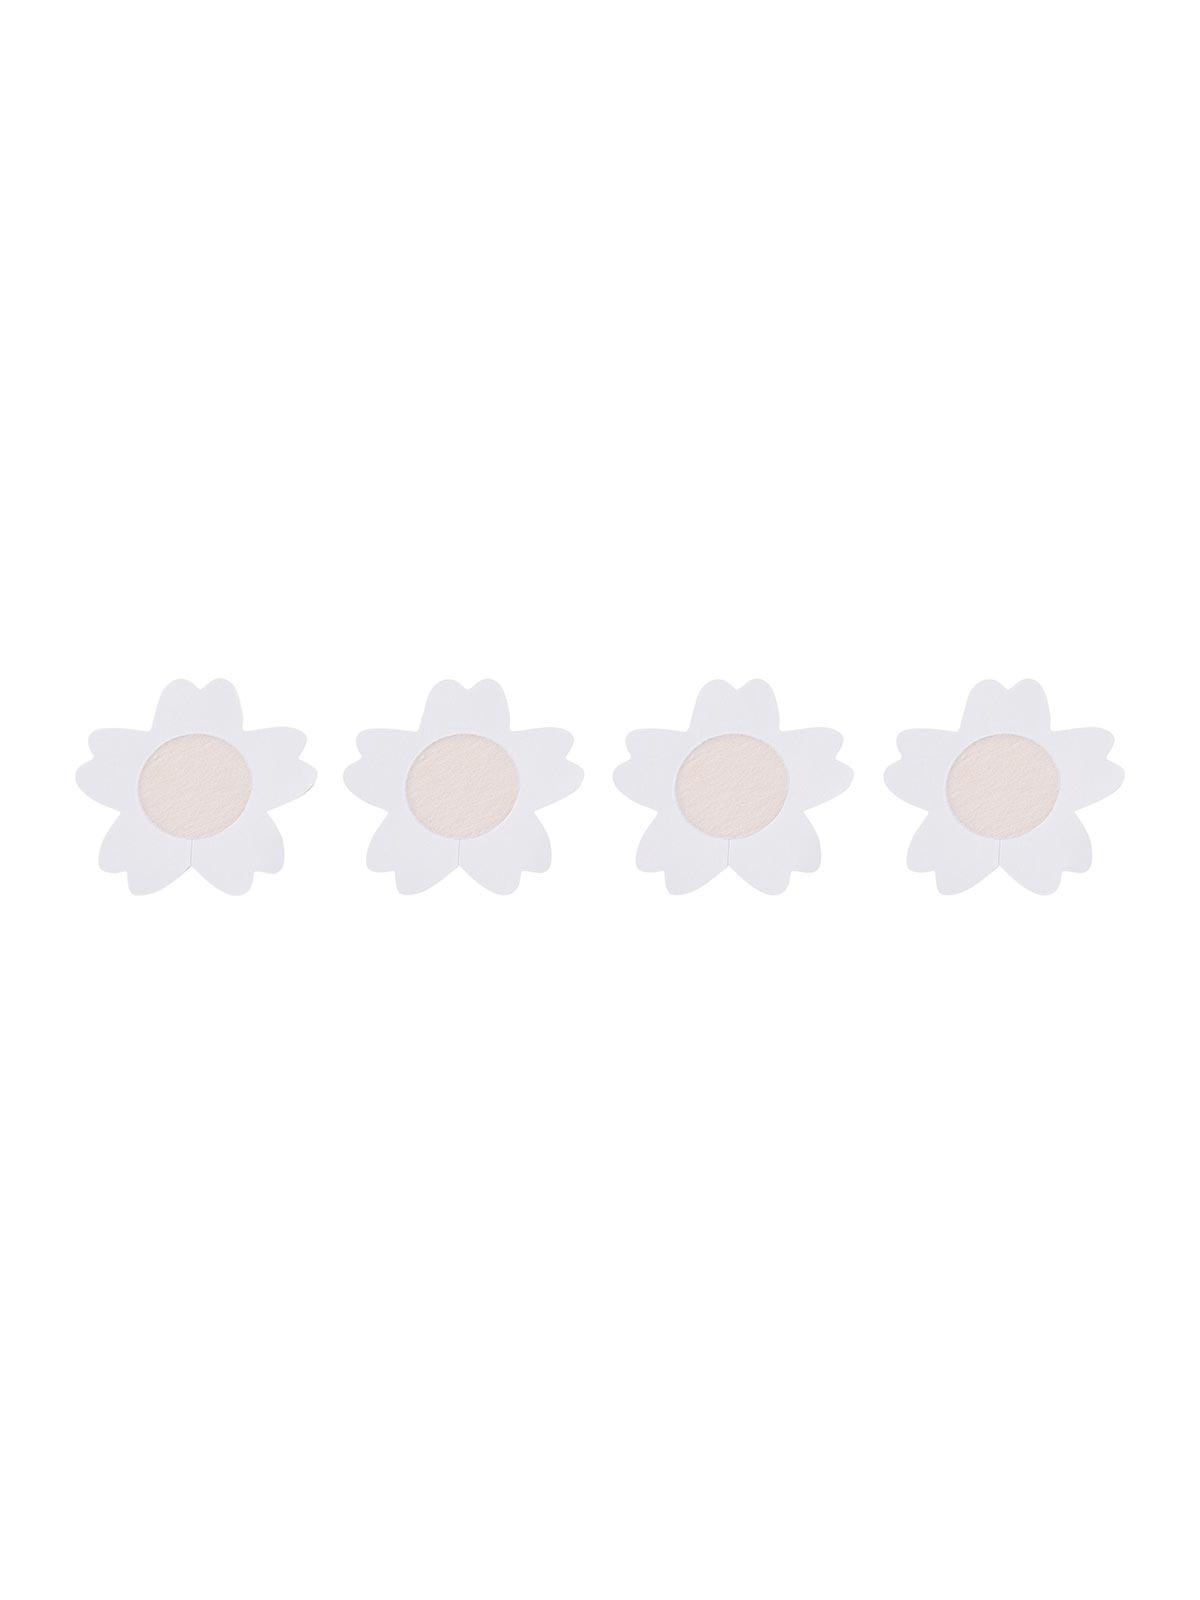 NIPPLE COVER SAKURA, 櫻花型胸貼 AC09009